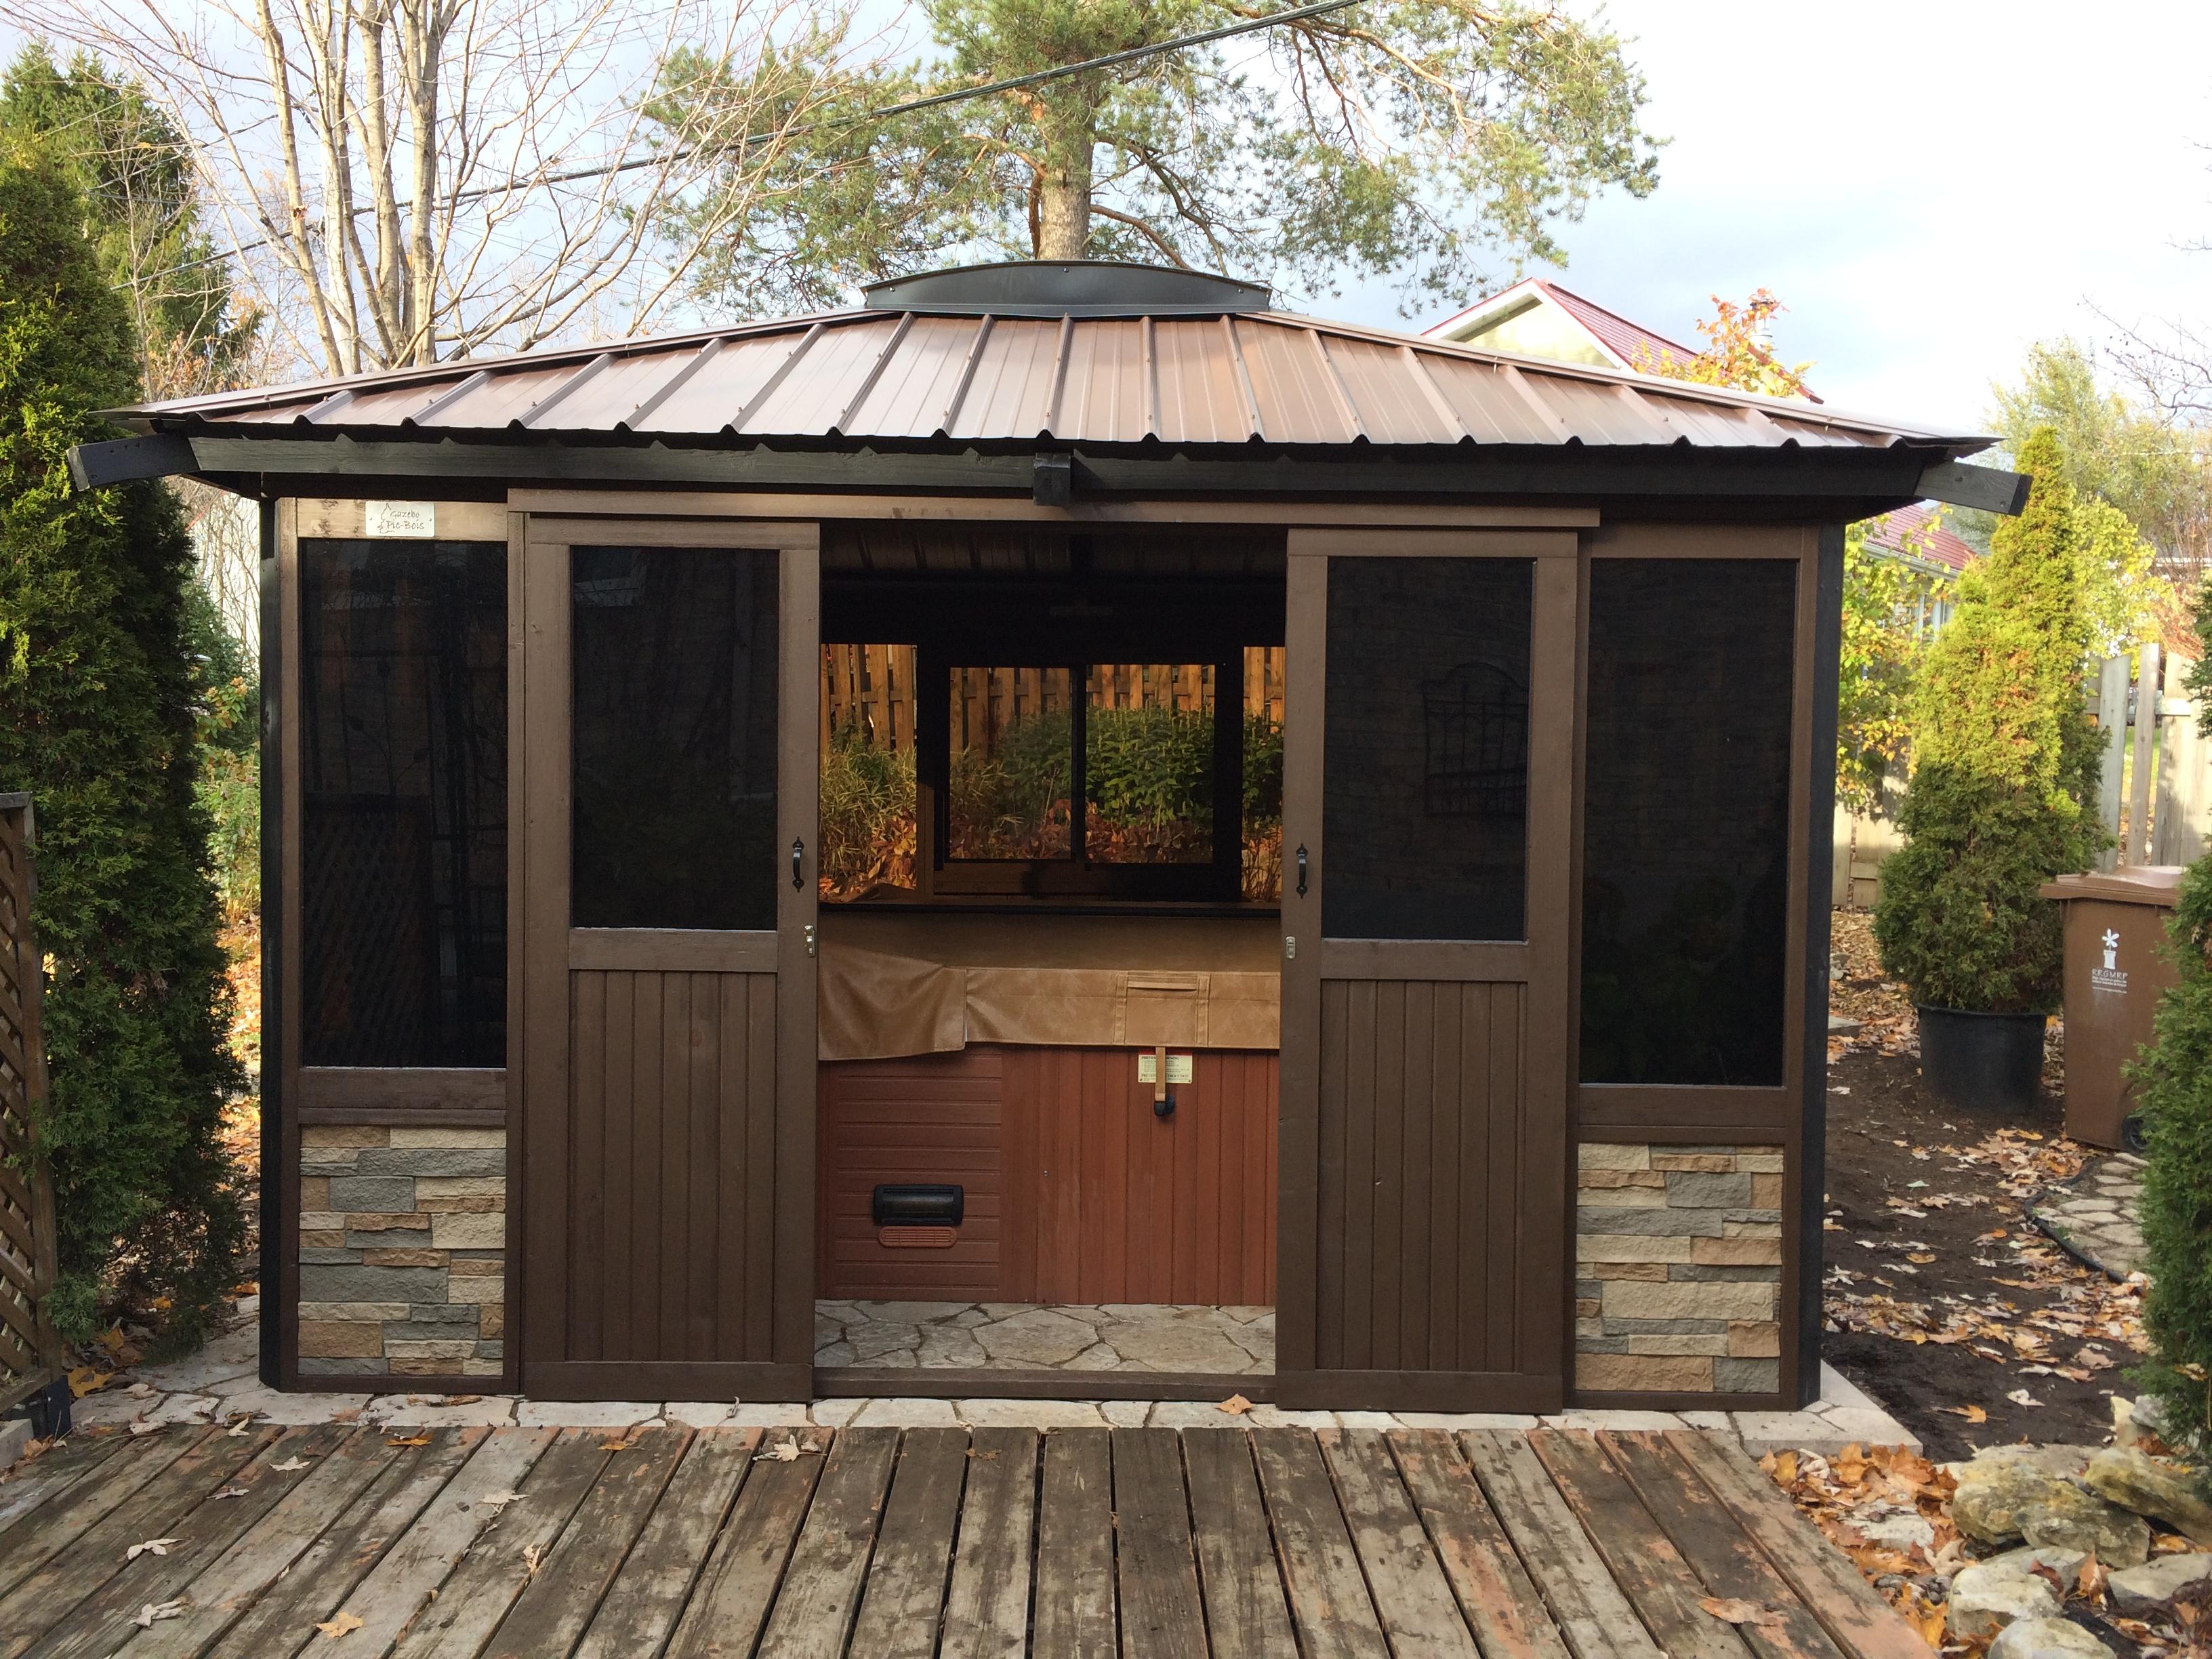 Fabriquer Une Tonnelle En Bois accueil gazebo abri soleil pergola terrasse - picbois - gazebo